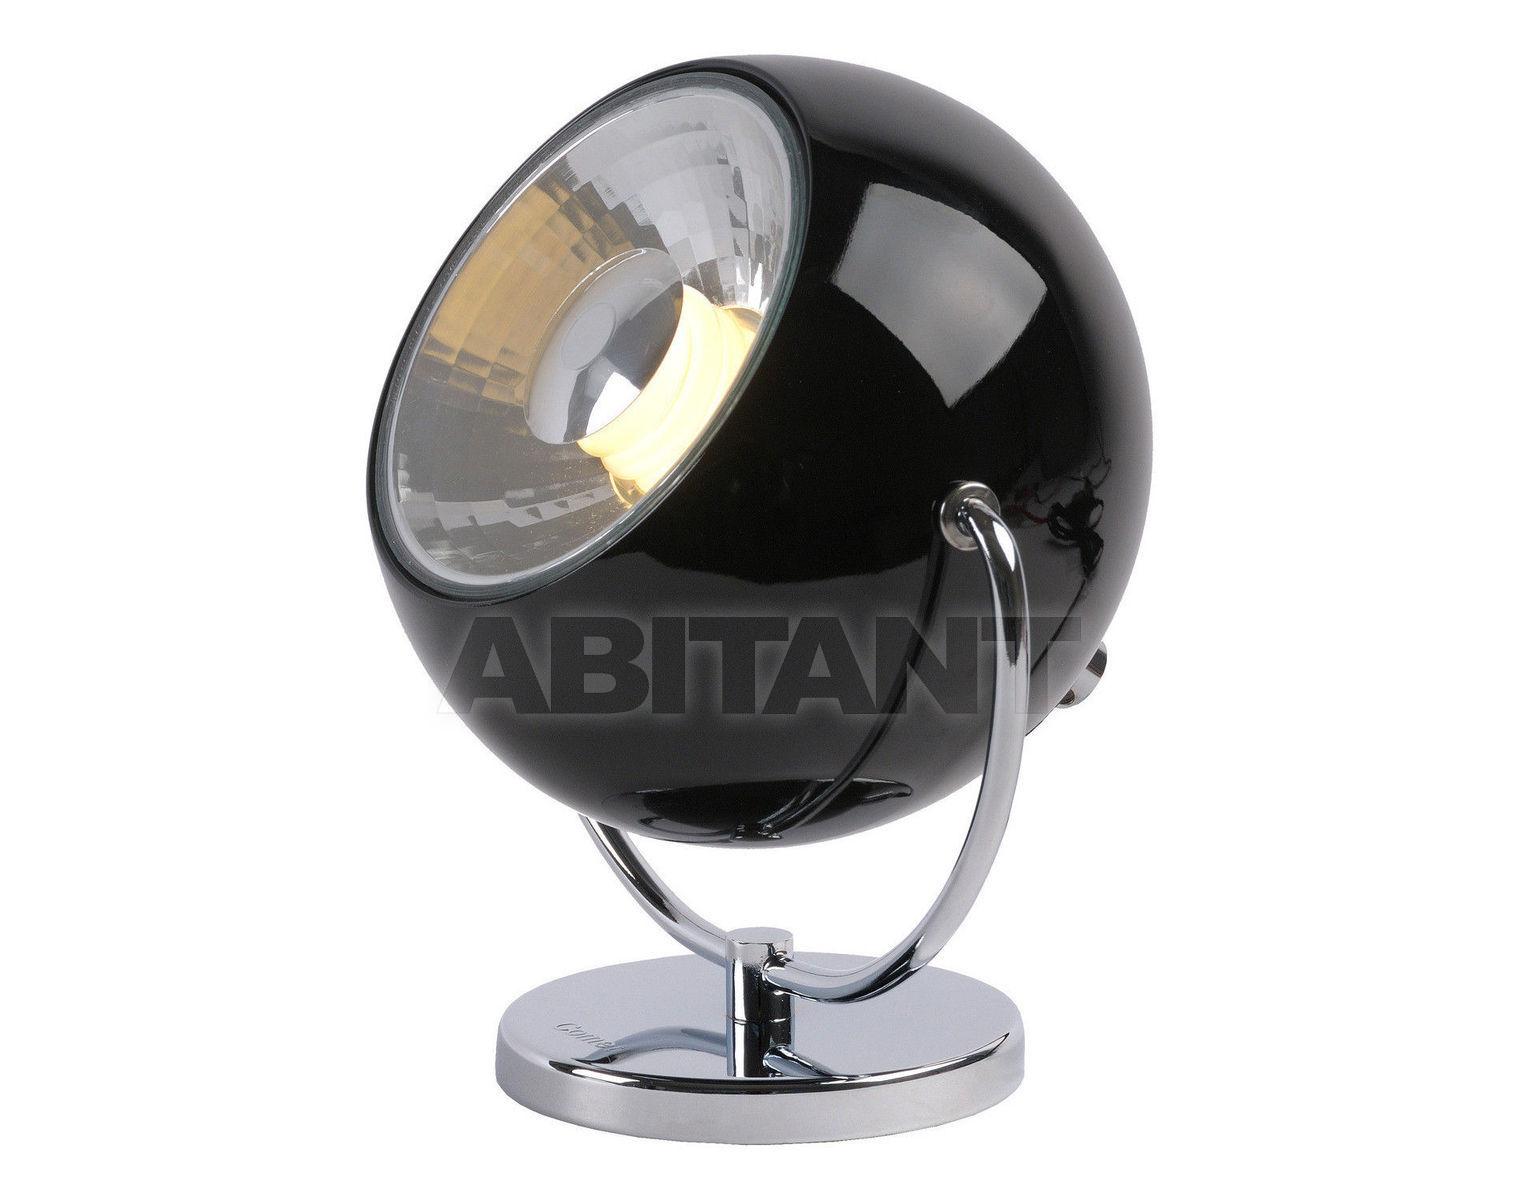 Купить Лампа настольная COMET Lucide  Floor & Table Lamps 31542/71/30